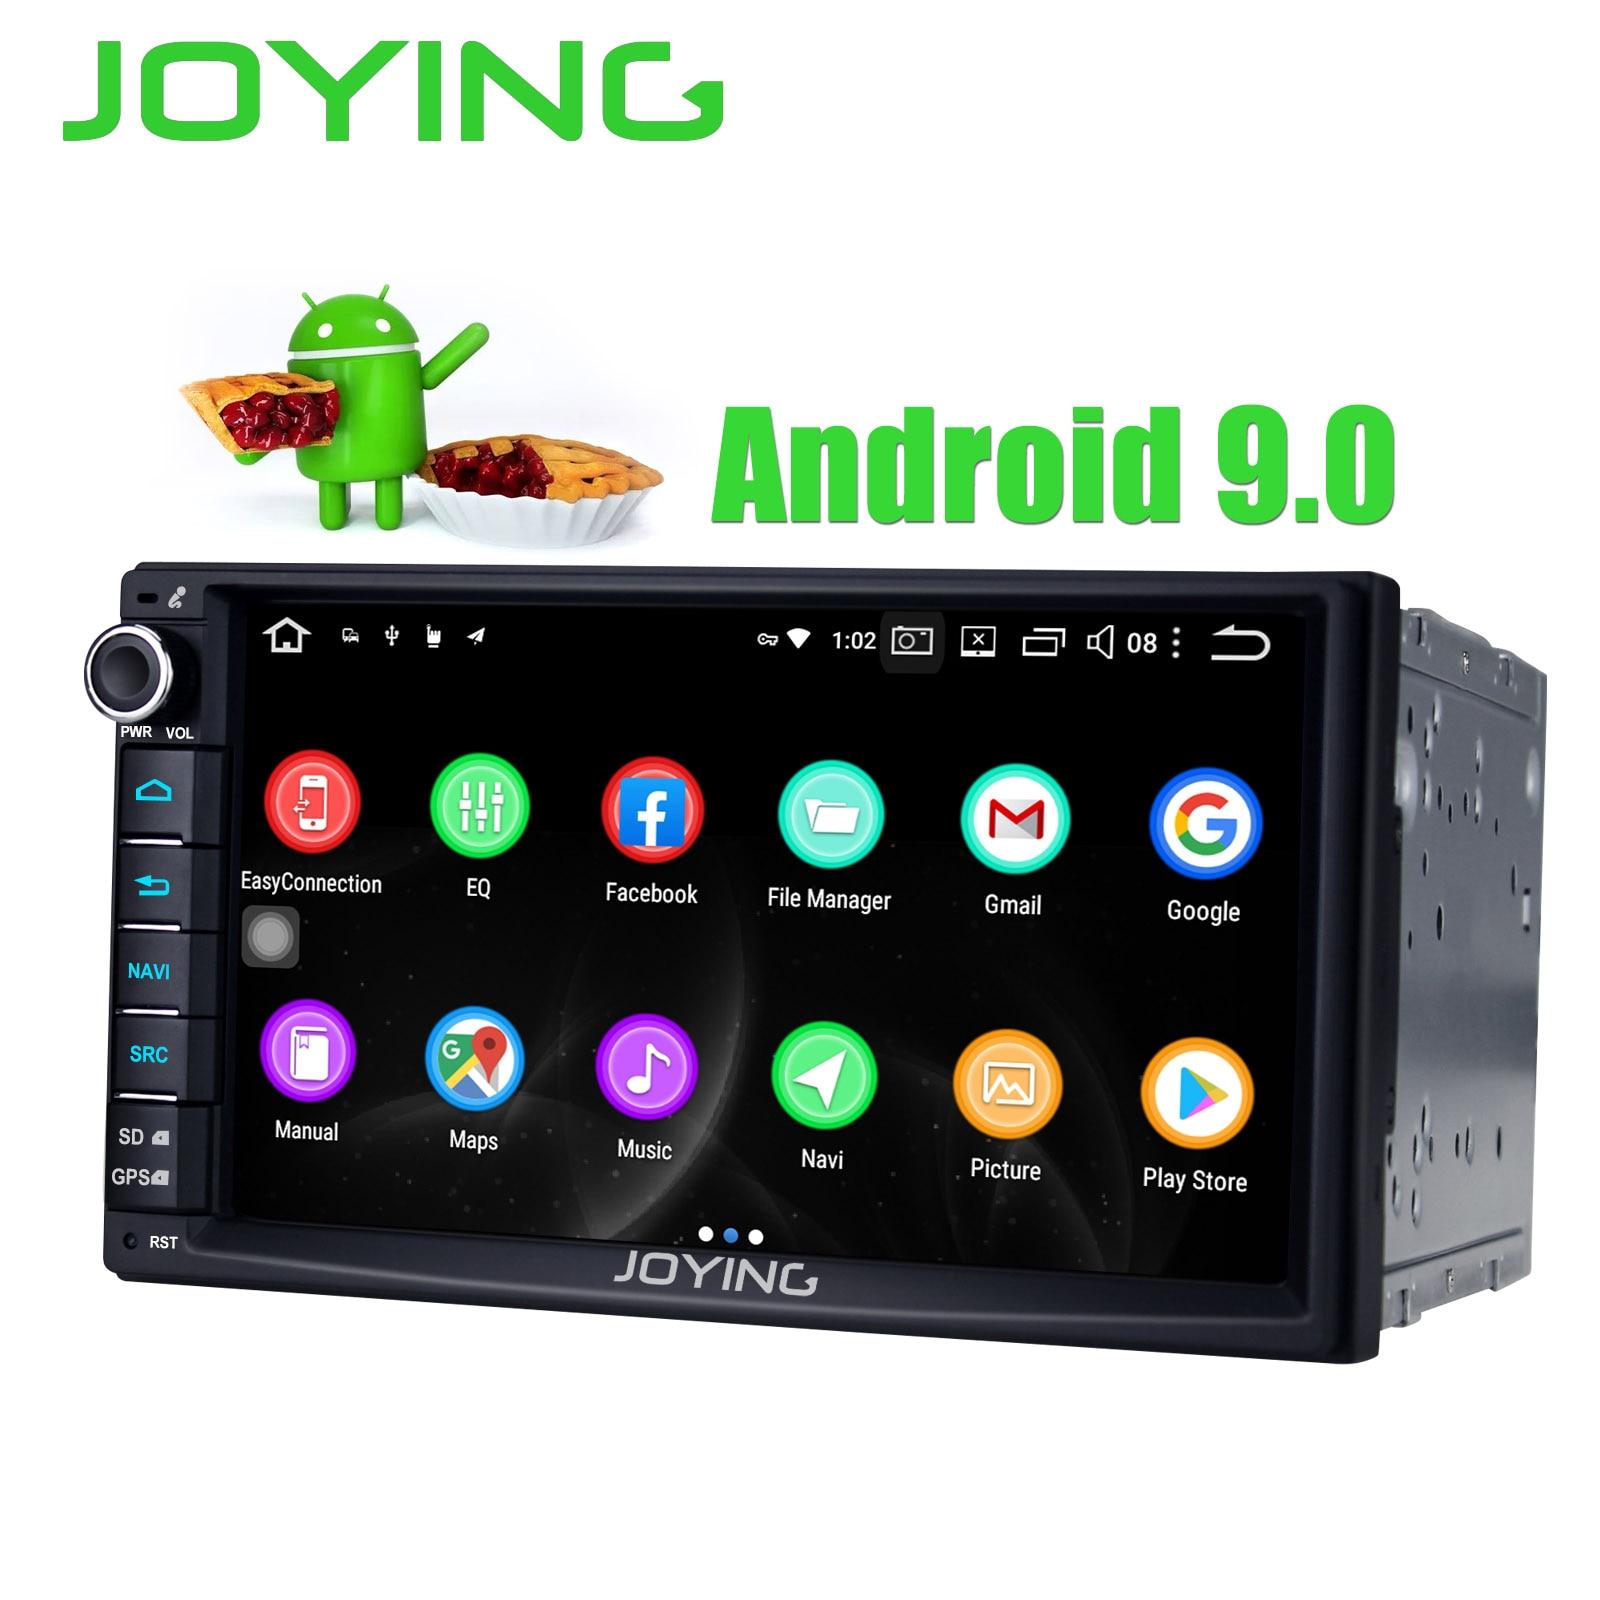 JOYING 2 Din Android 9.0 Unversal 7